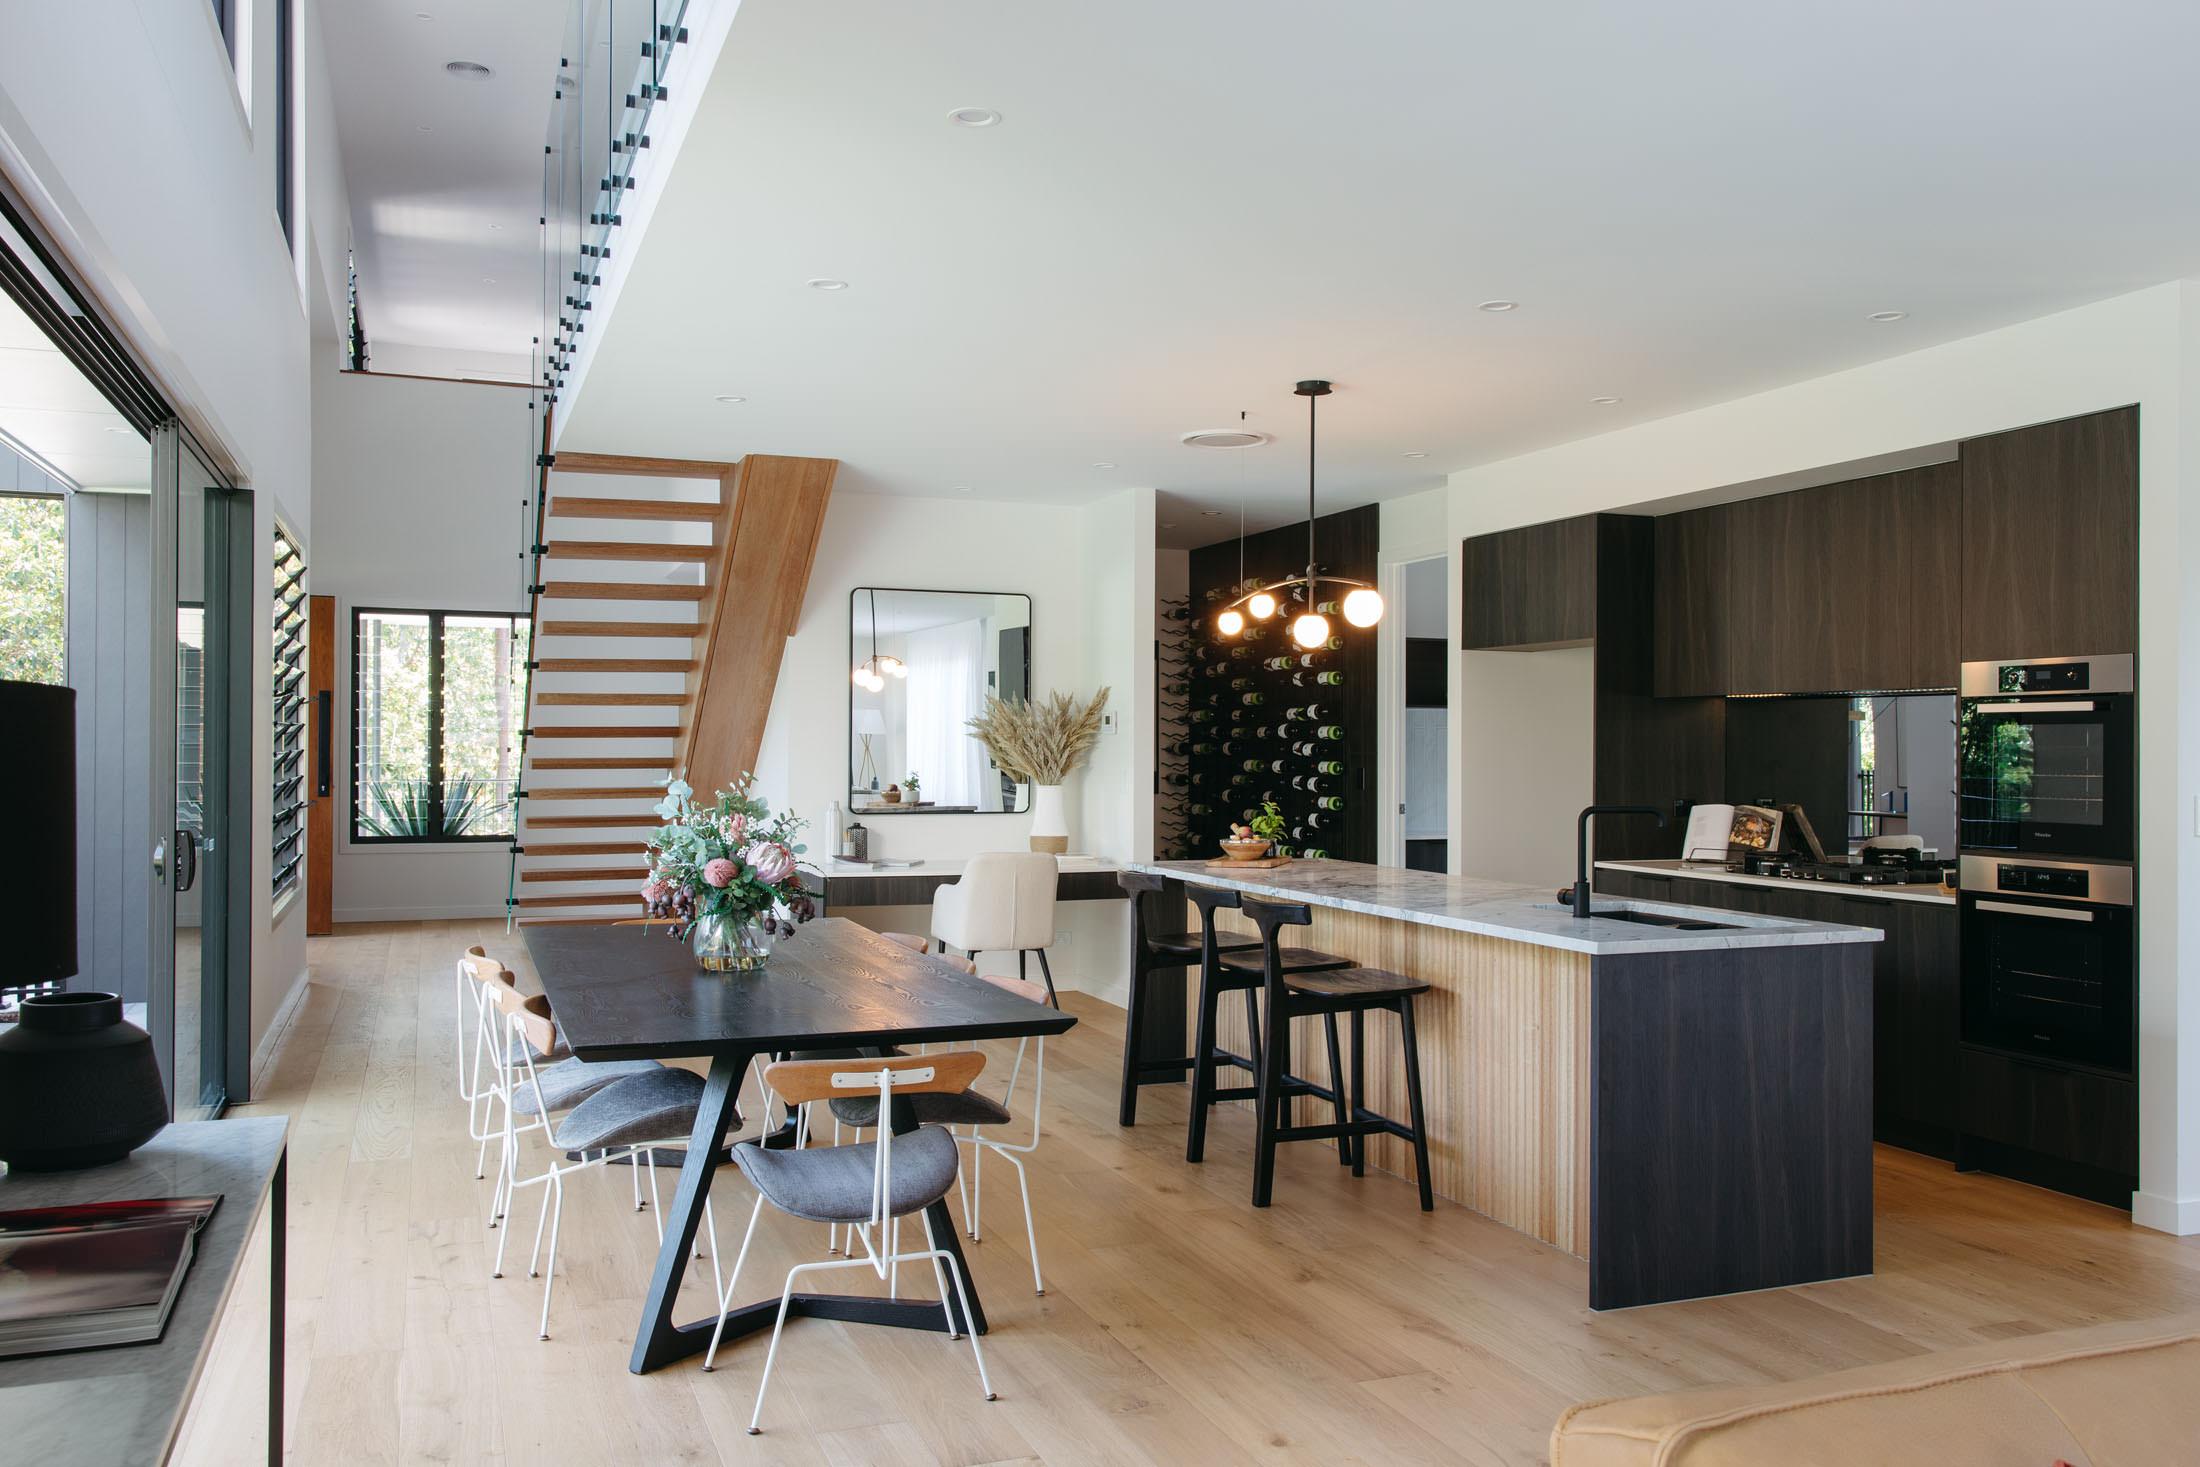 Architect Designed Family Home